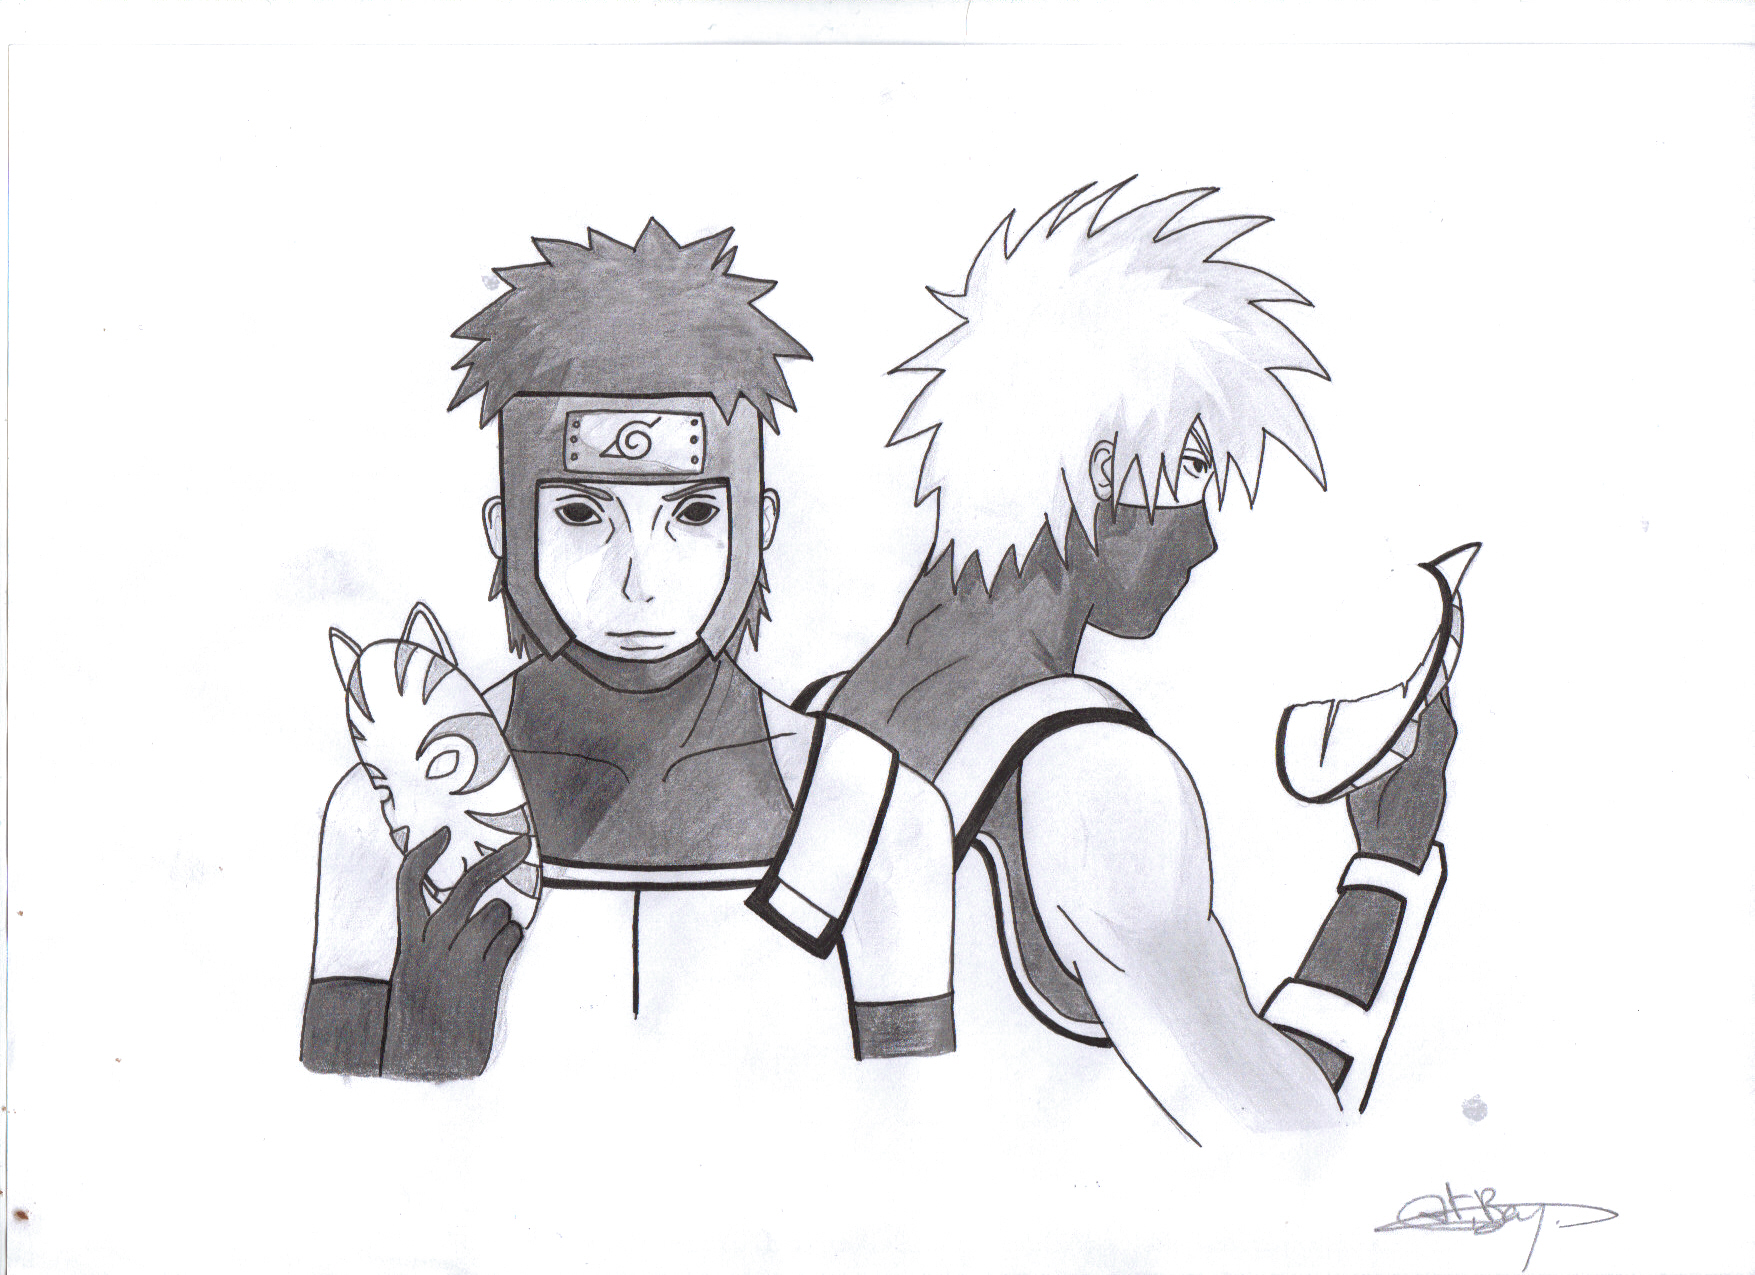 Naruto Anbu Masks By Purpledragon42 | Short News Poster